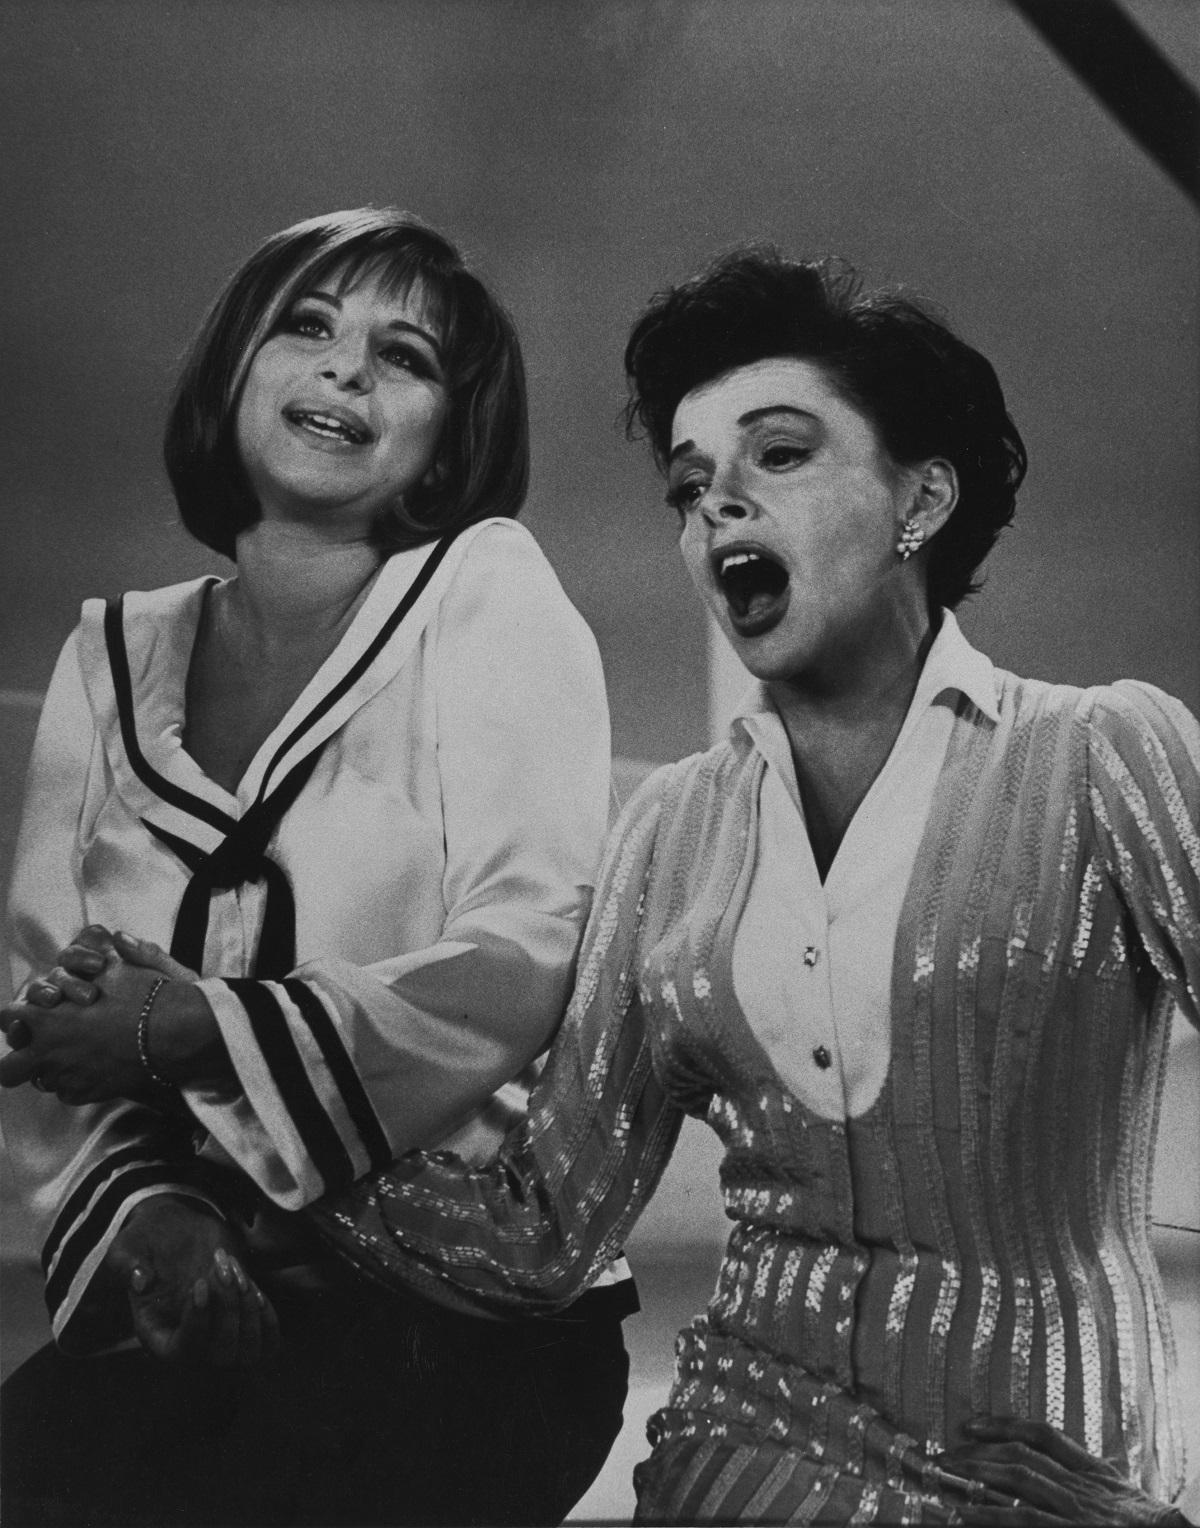 Barbra Streisand and Judy Garland